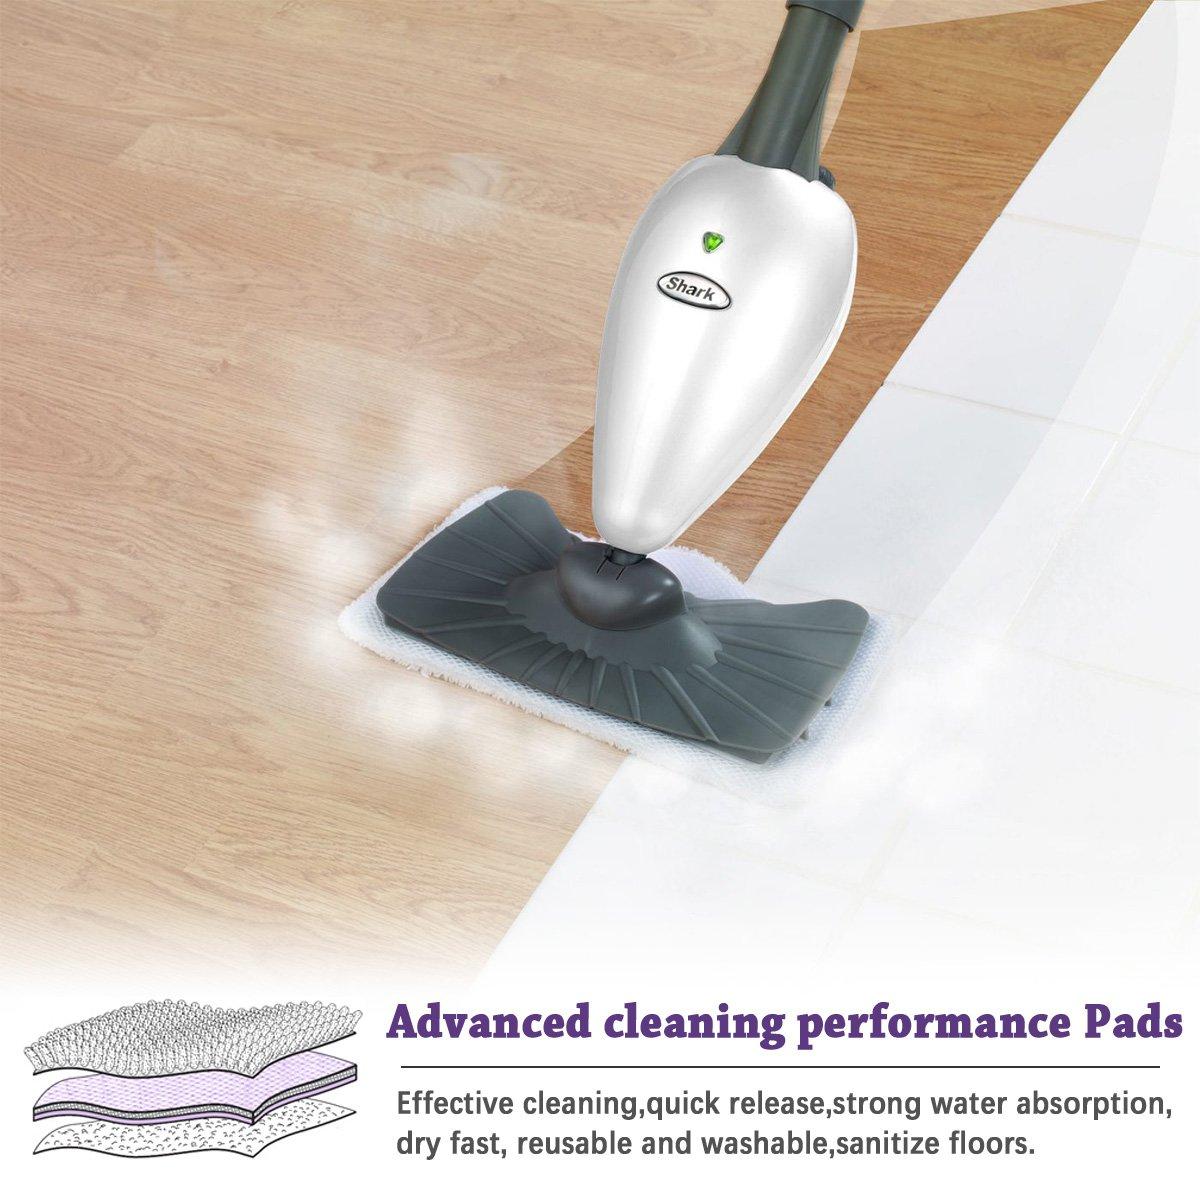 Shark Pro Steam And Spray Mop On Laminate Floors Carpet